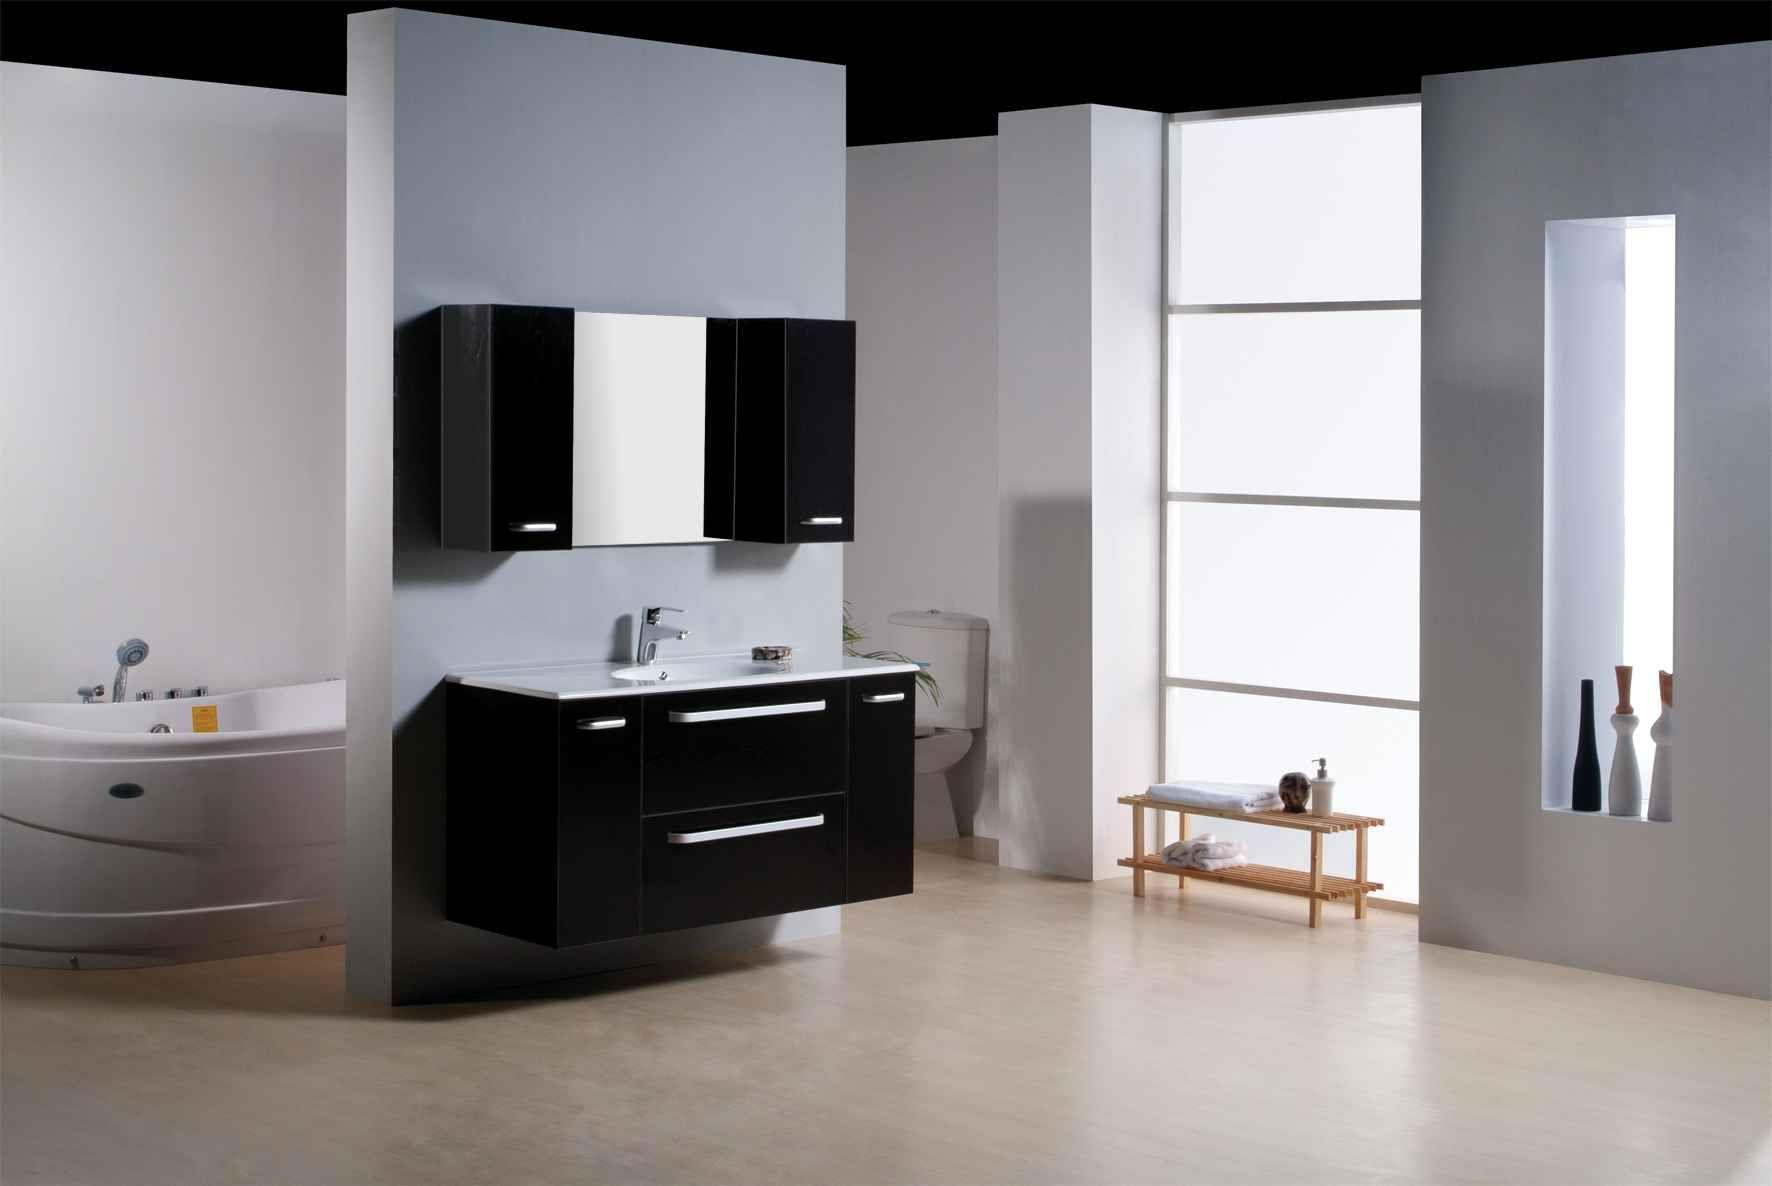 Best Photo Gallery Websites Bathroom Wonderful Small Spaces Modern Bathroom Storage Cabinets Ideas Also Sink Bathroom With Espresso Bathroom Wall Cabinet Bathtubs Countertops And